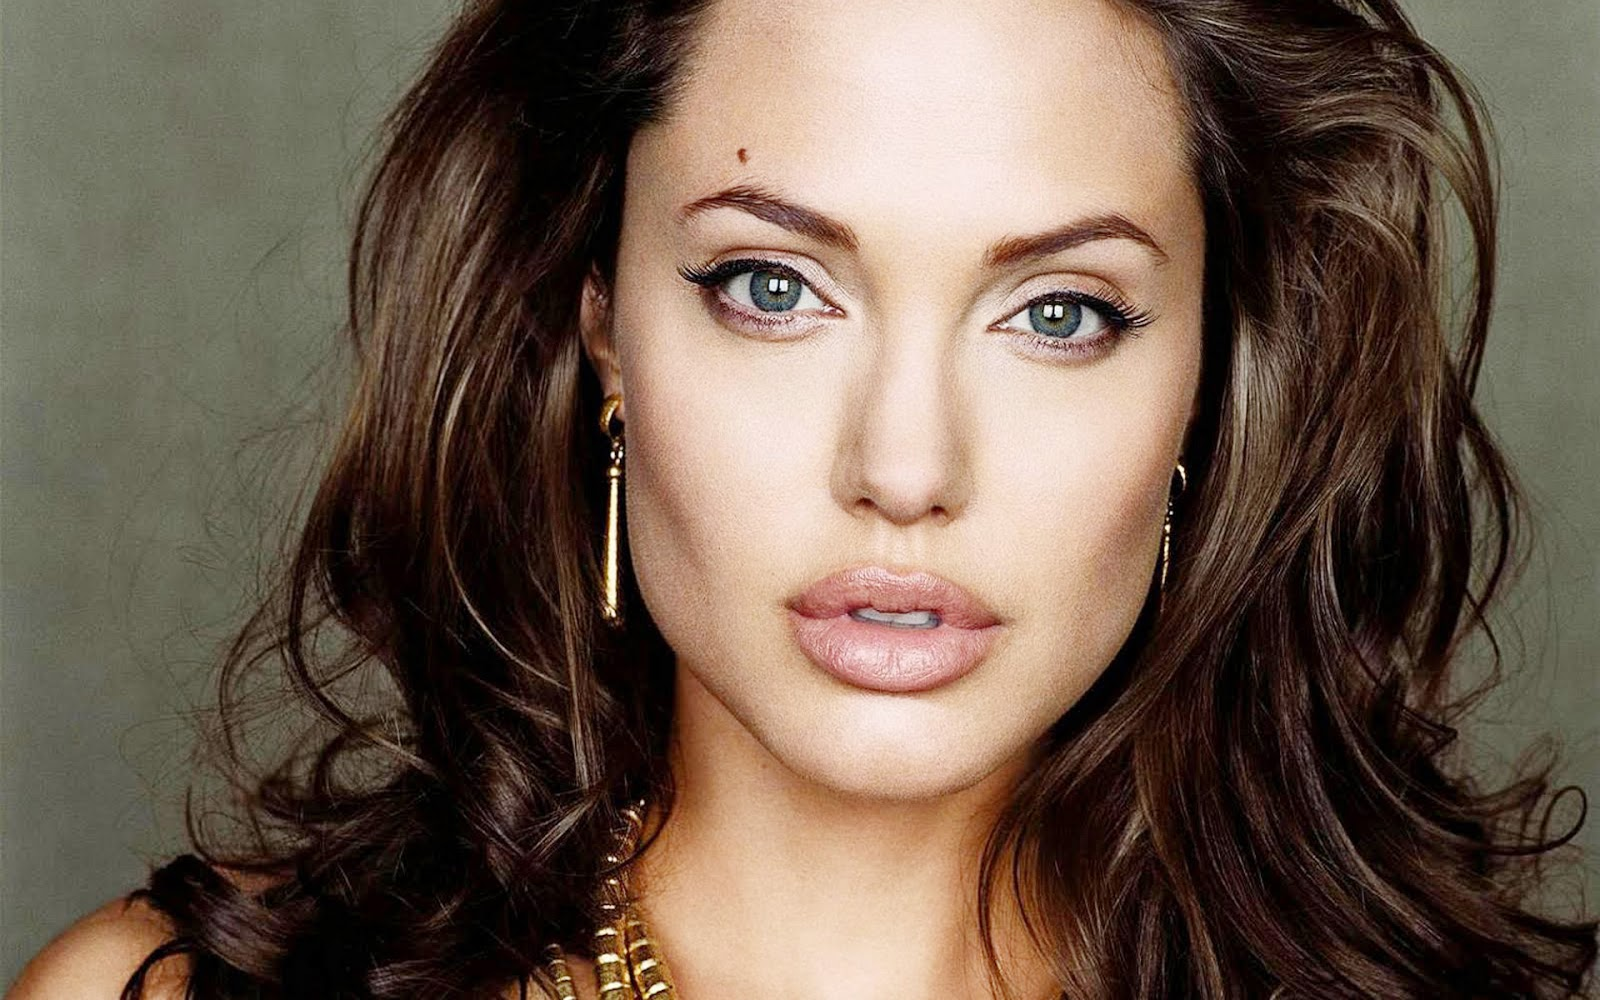 Fotos De Angelina Jolie 5